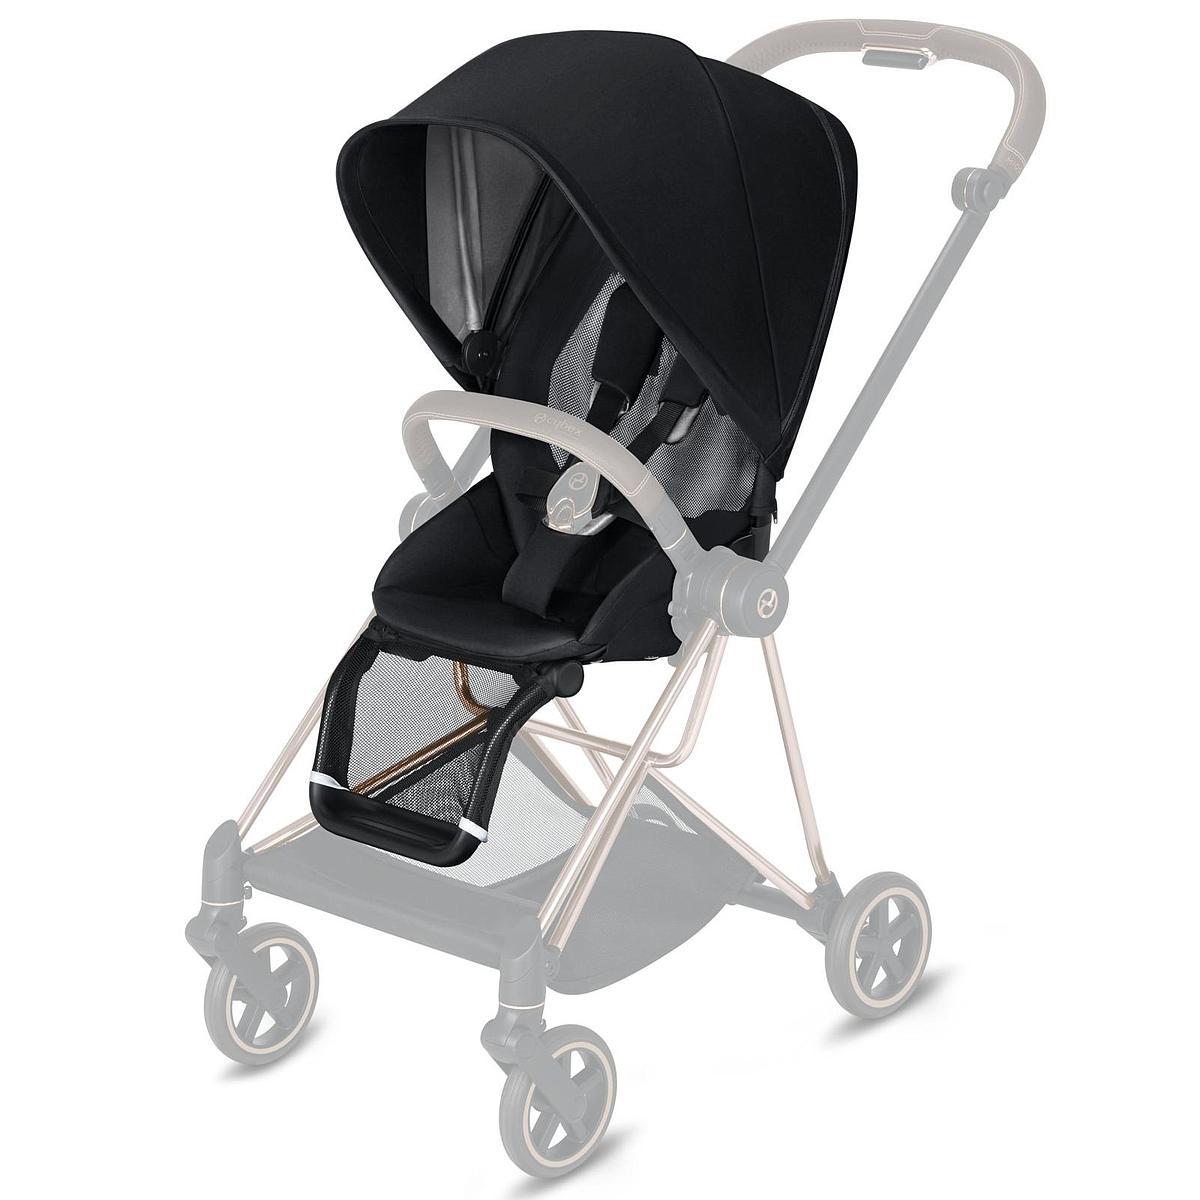 Asiento-pack silla MIOS Cybex premium black-black